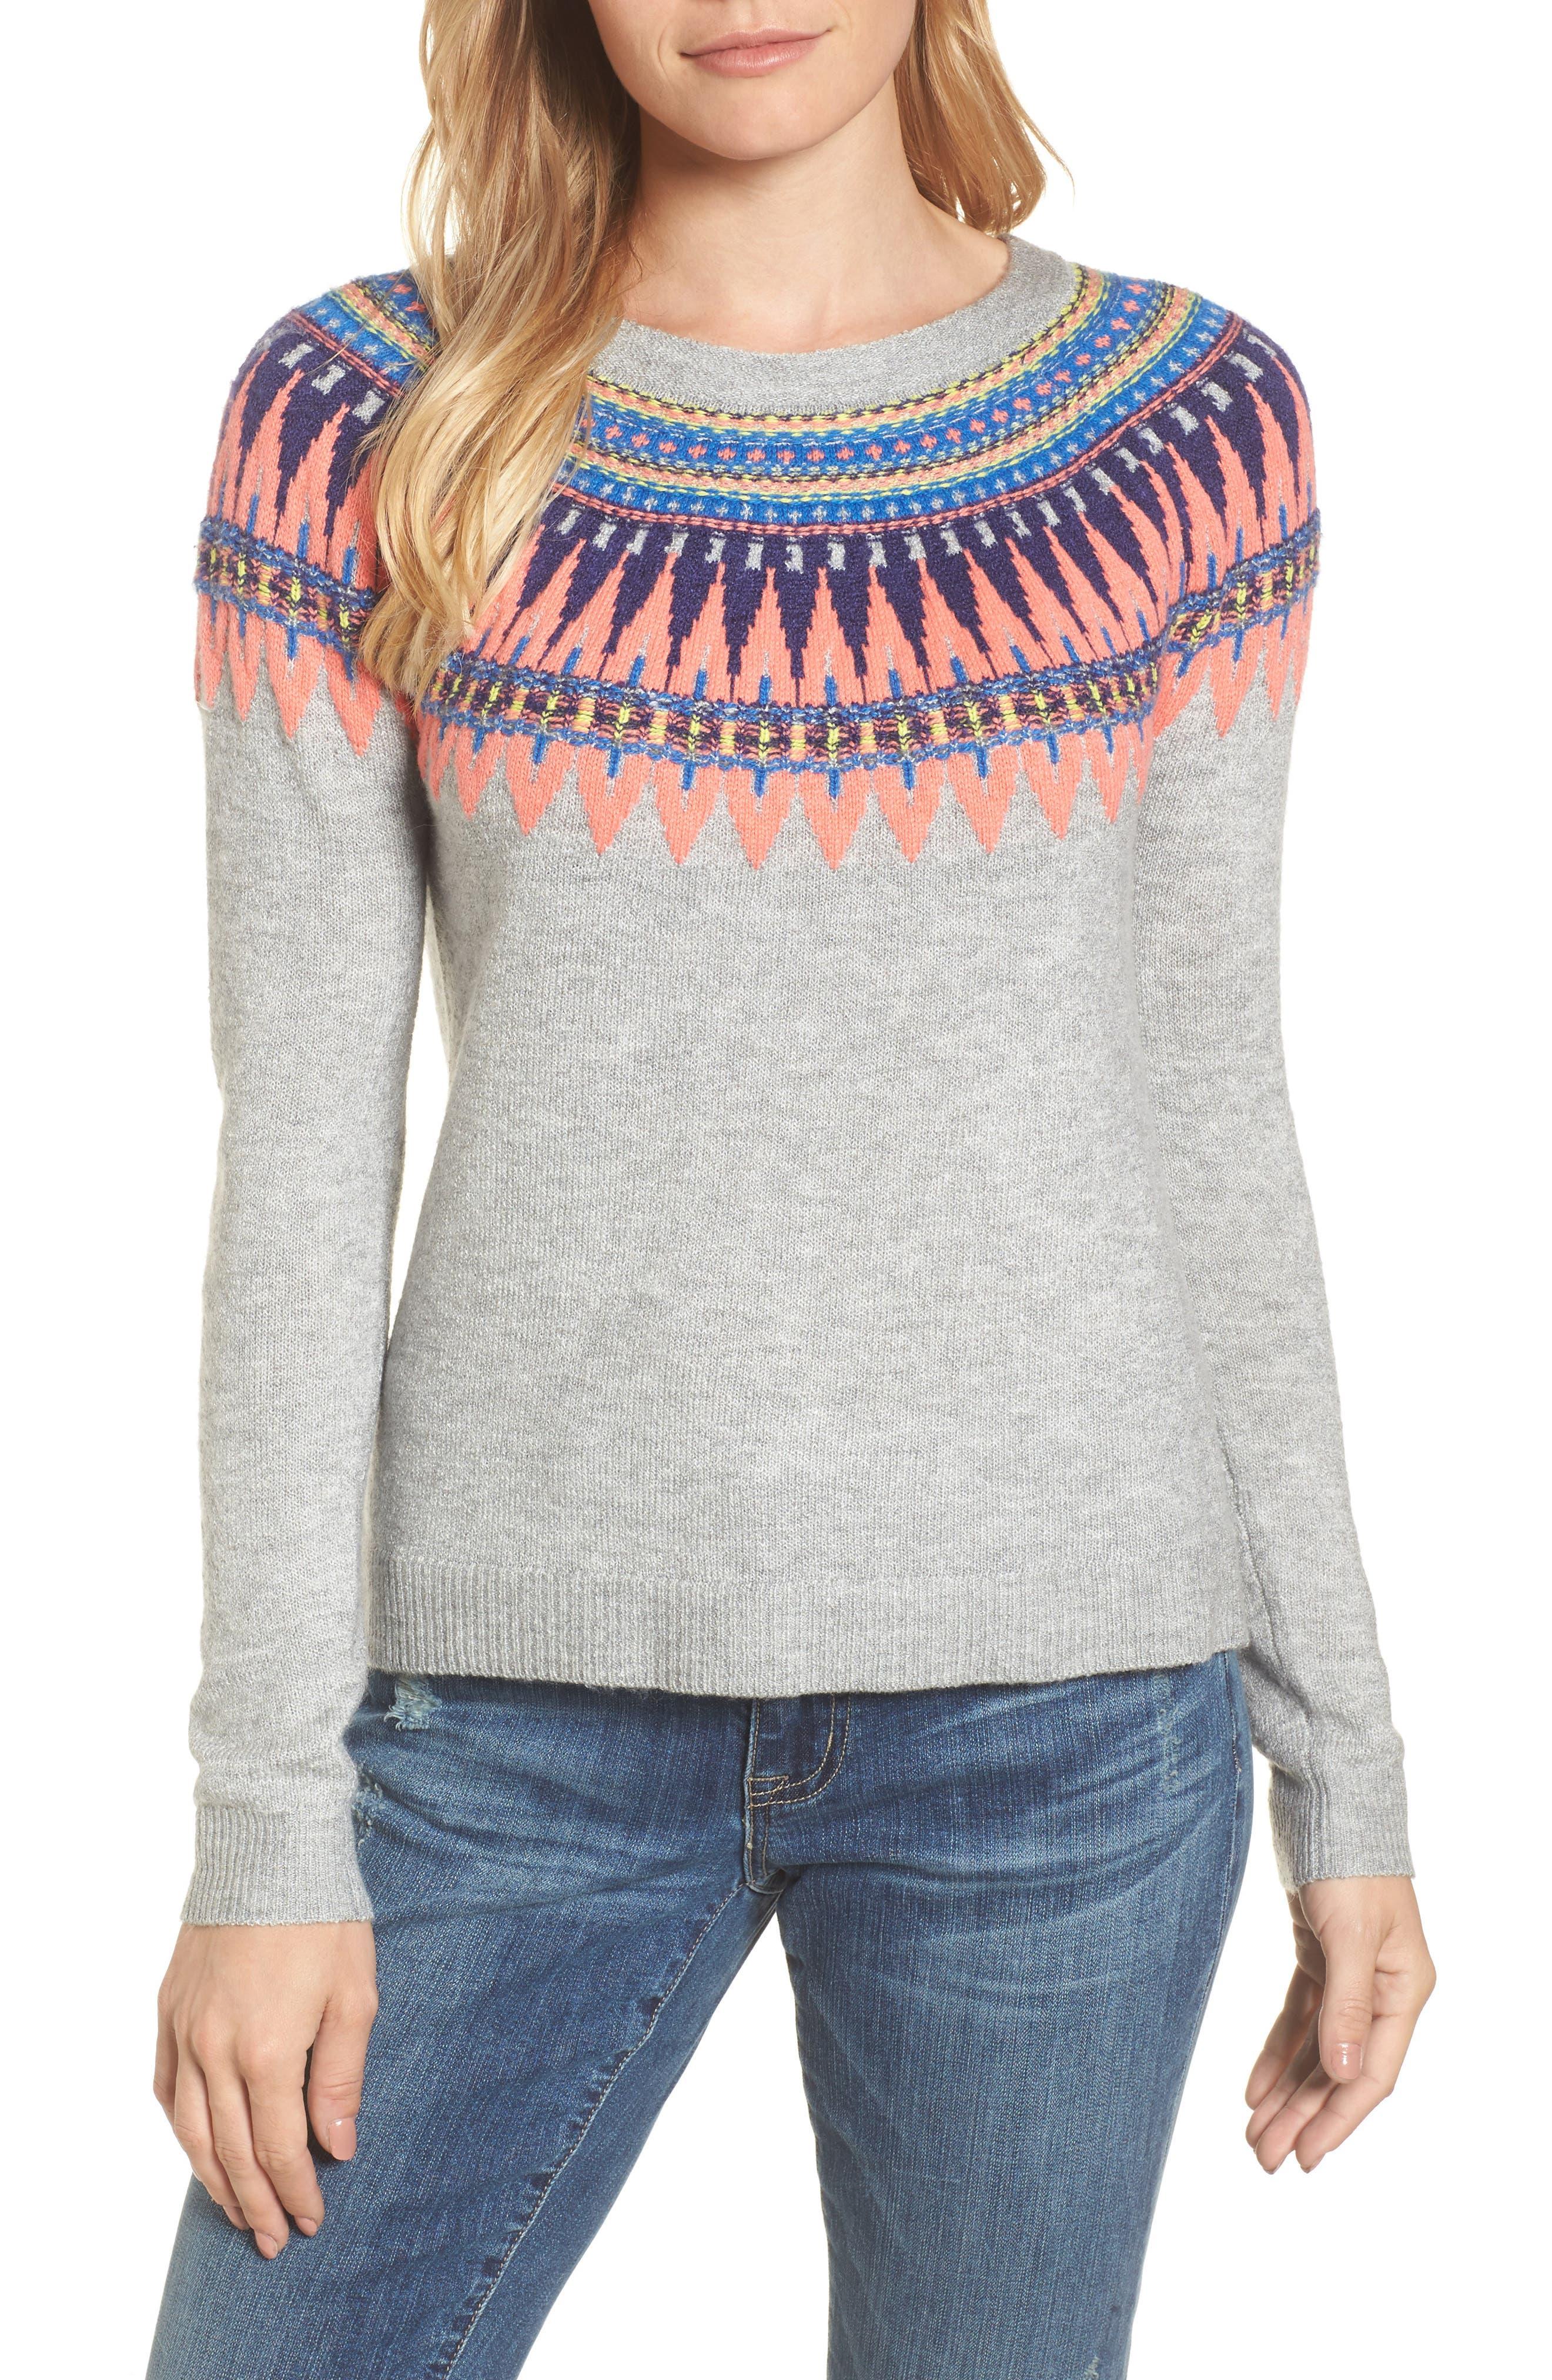 Main Image - Caslon® Tie Back Patterned Sweater (Regular & Petite)